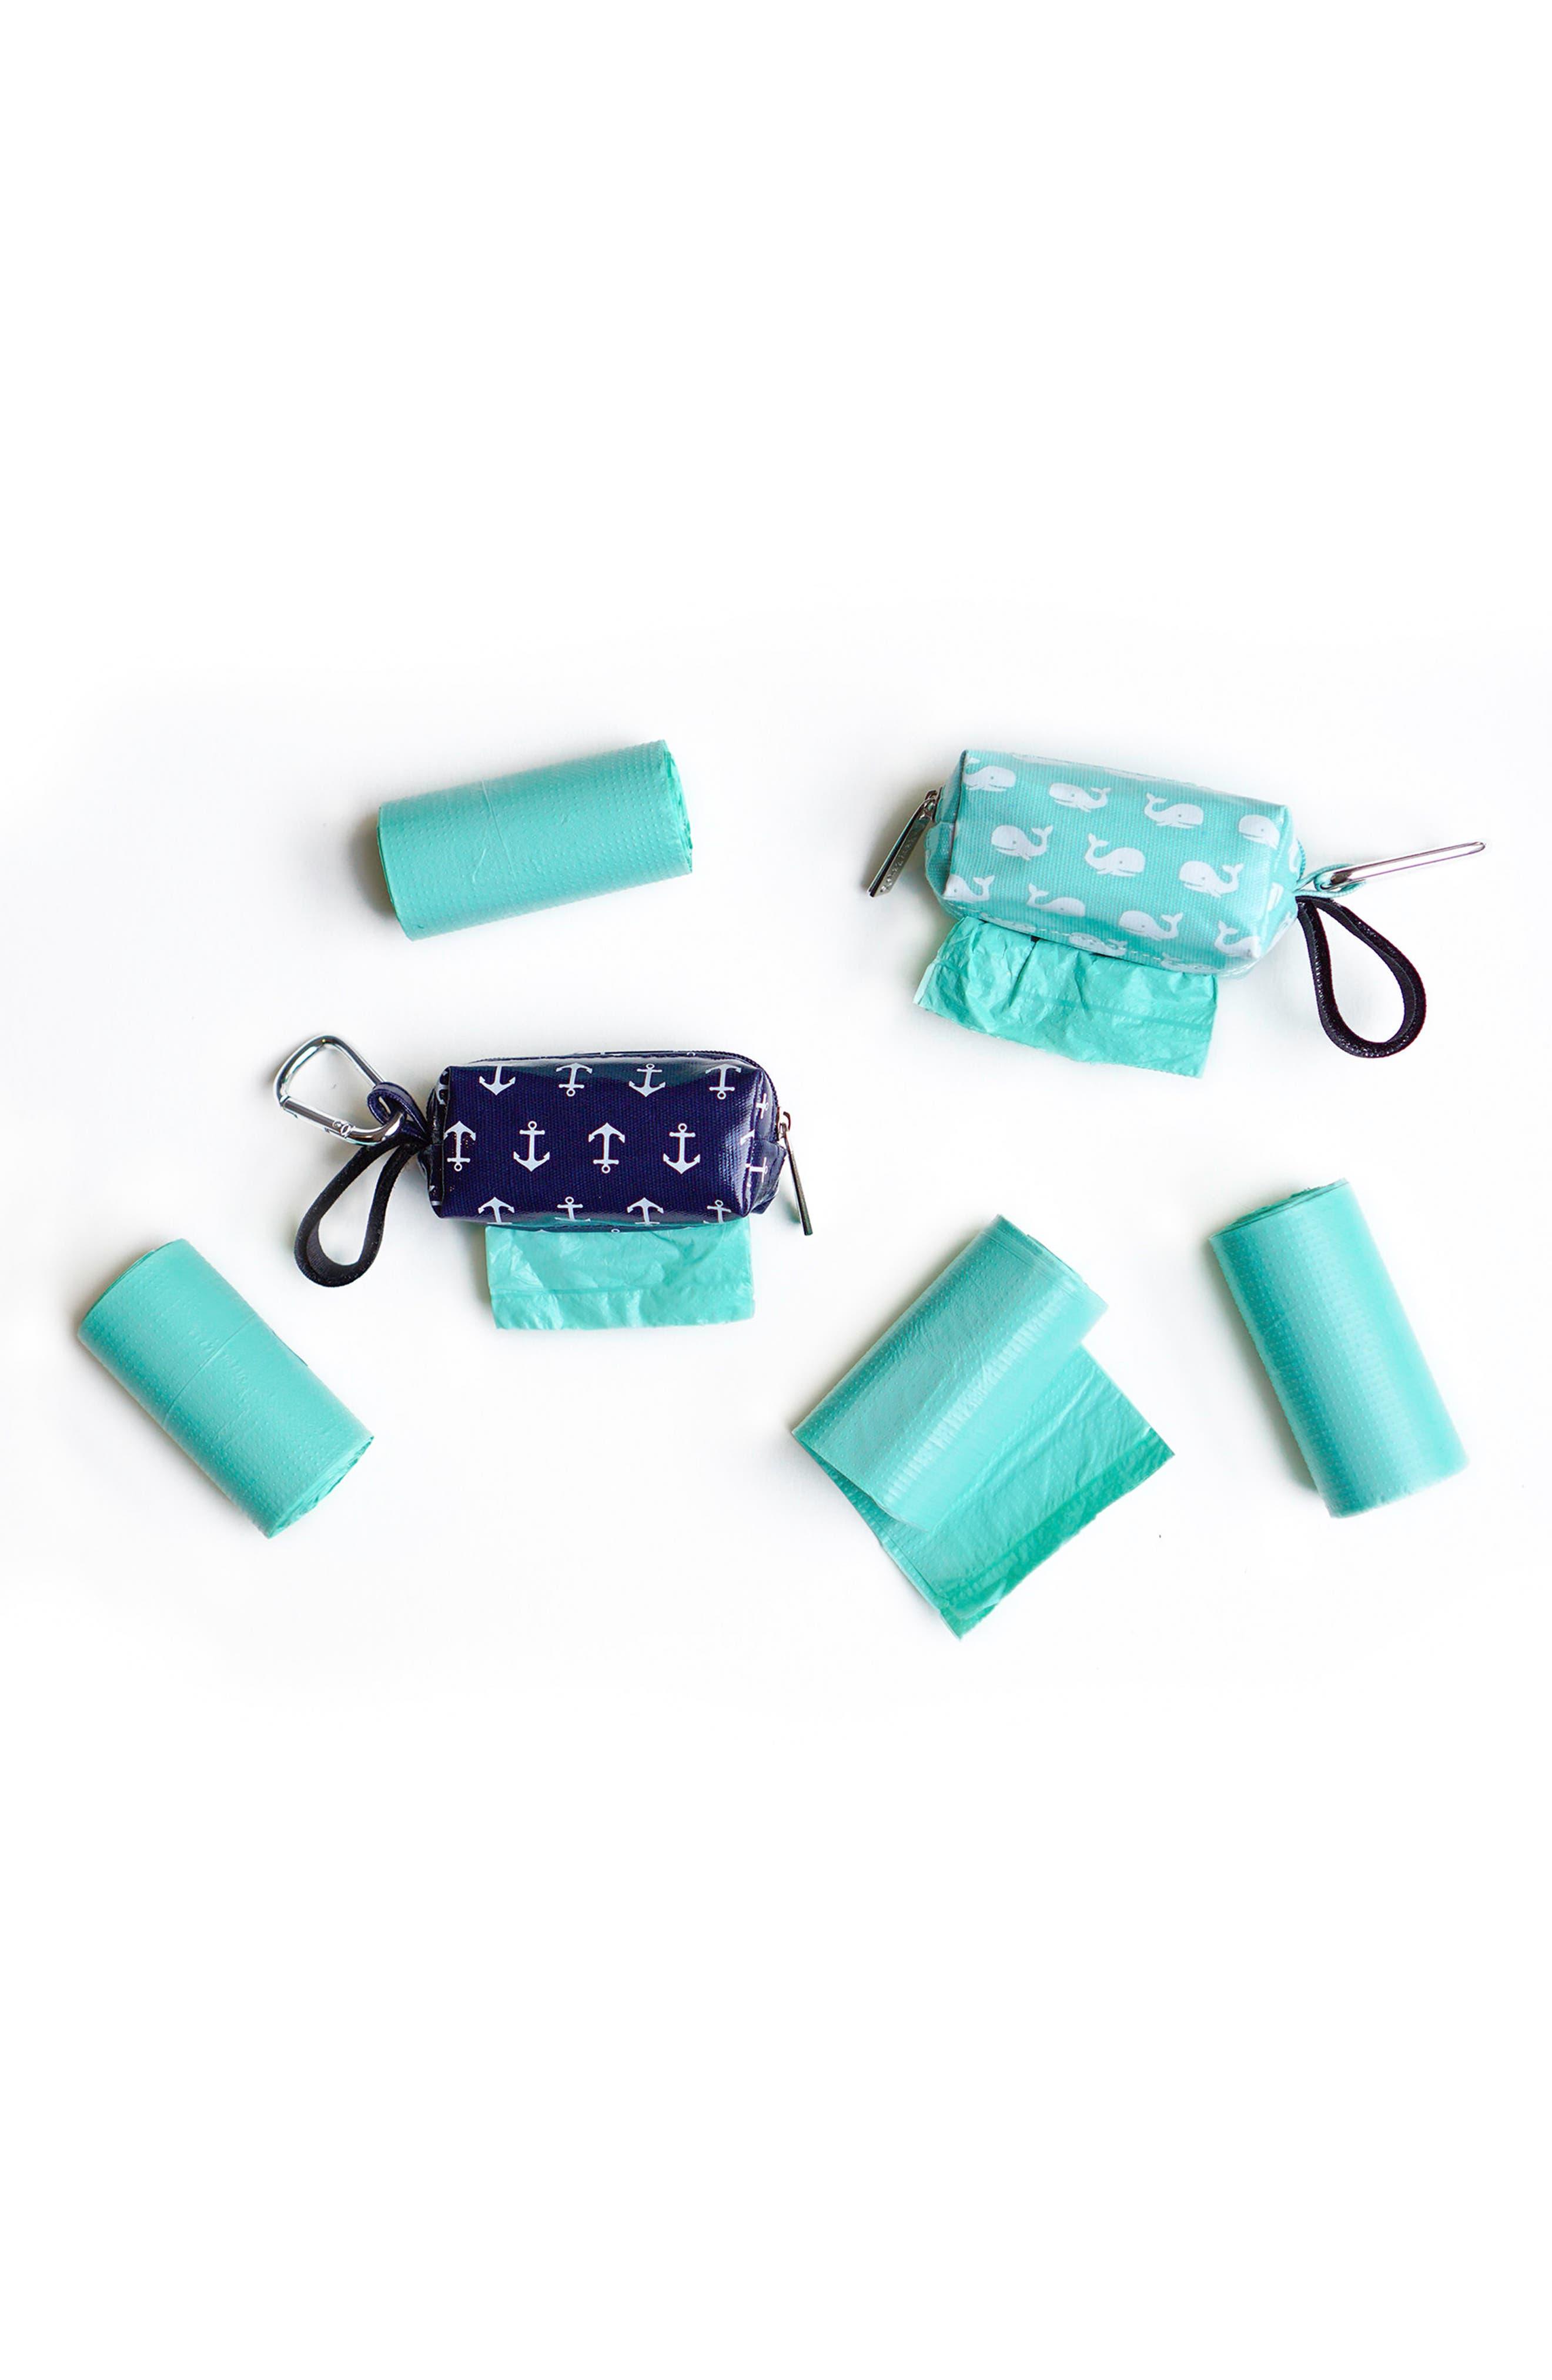 Portable Clip-On Dispenser & Bag Set,                             Alternate thumbnail 2, color,                             Navy/ Seafoam